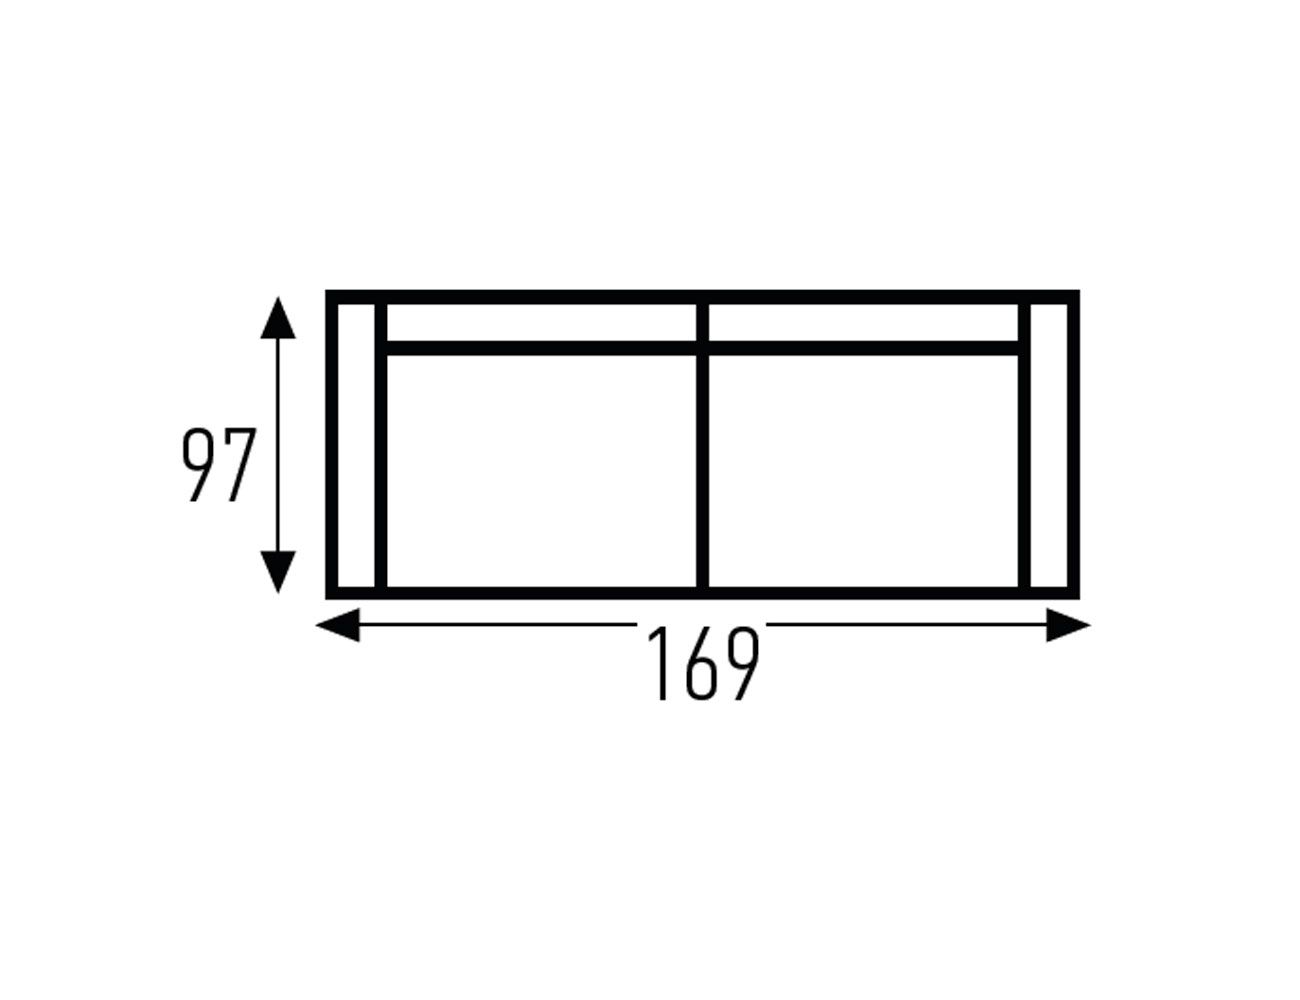 Croquis sofa 3 plaza 1694